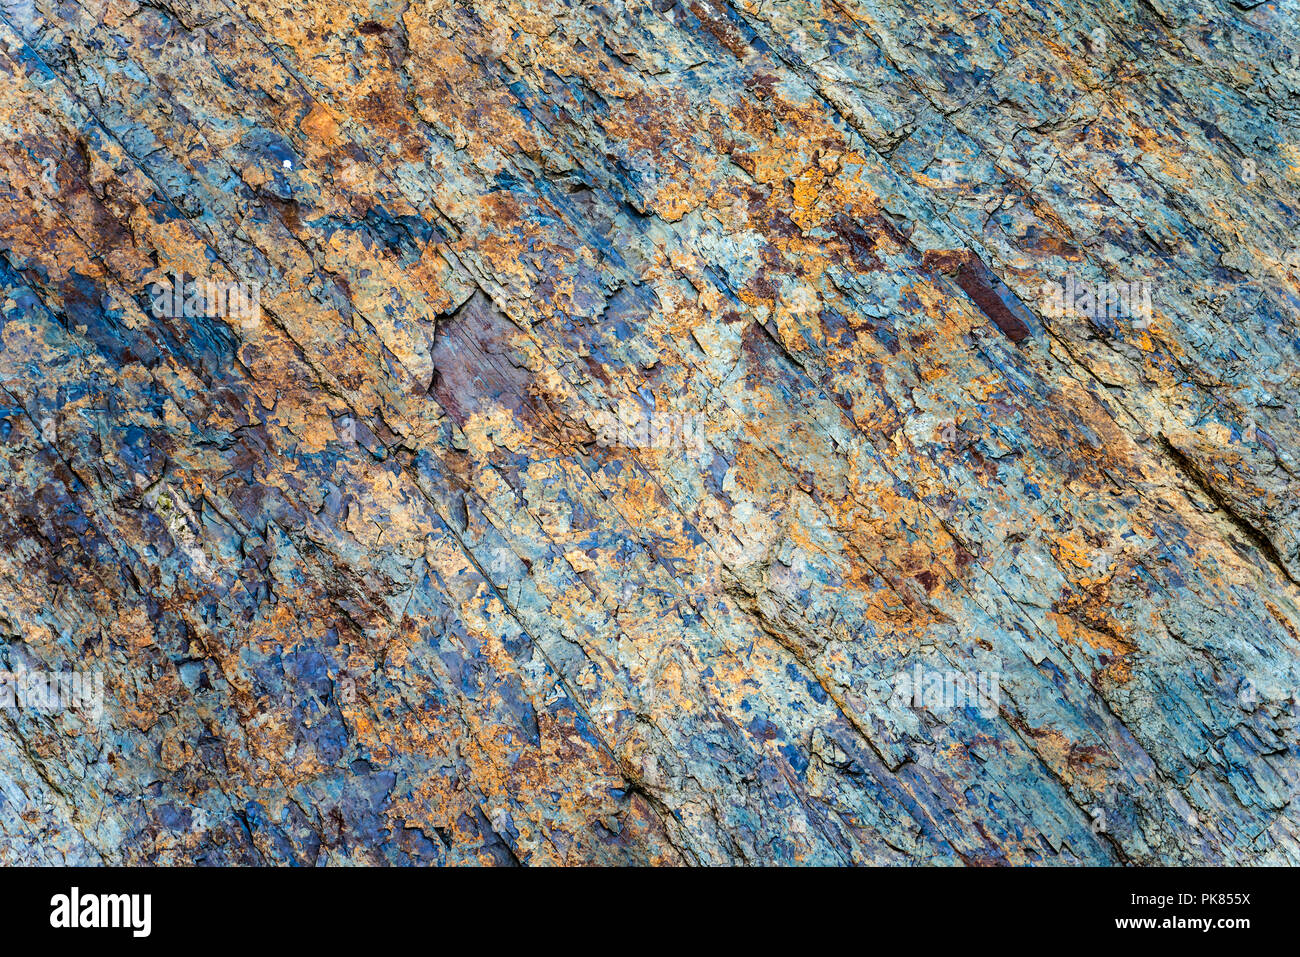 Slaty natural rock texture, Asel, Lake Edersee, Hesse, Germany, Europe - Stock Image